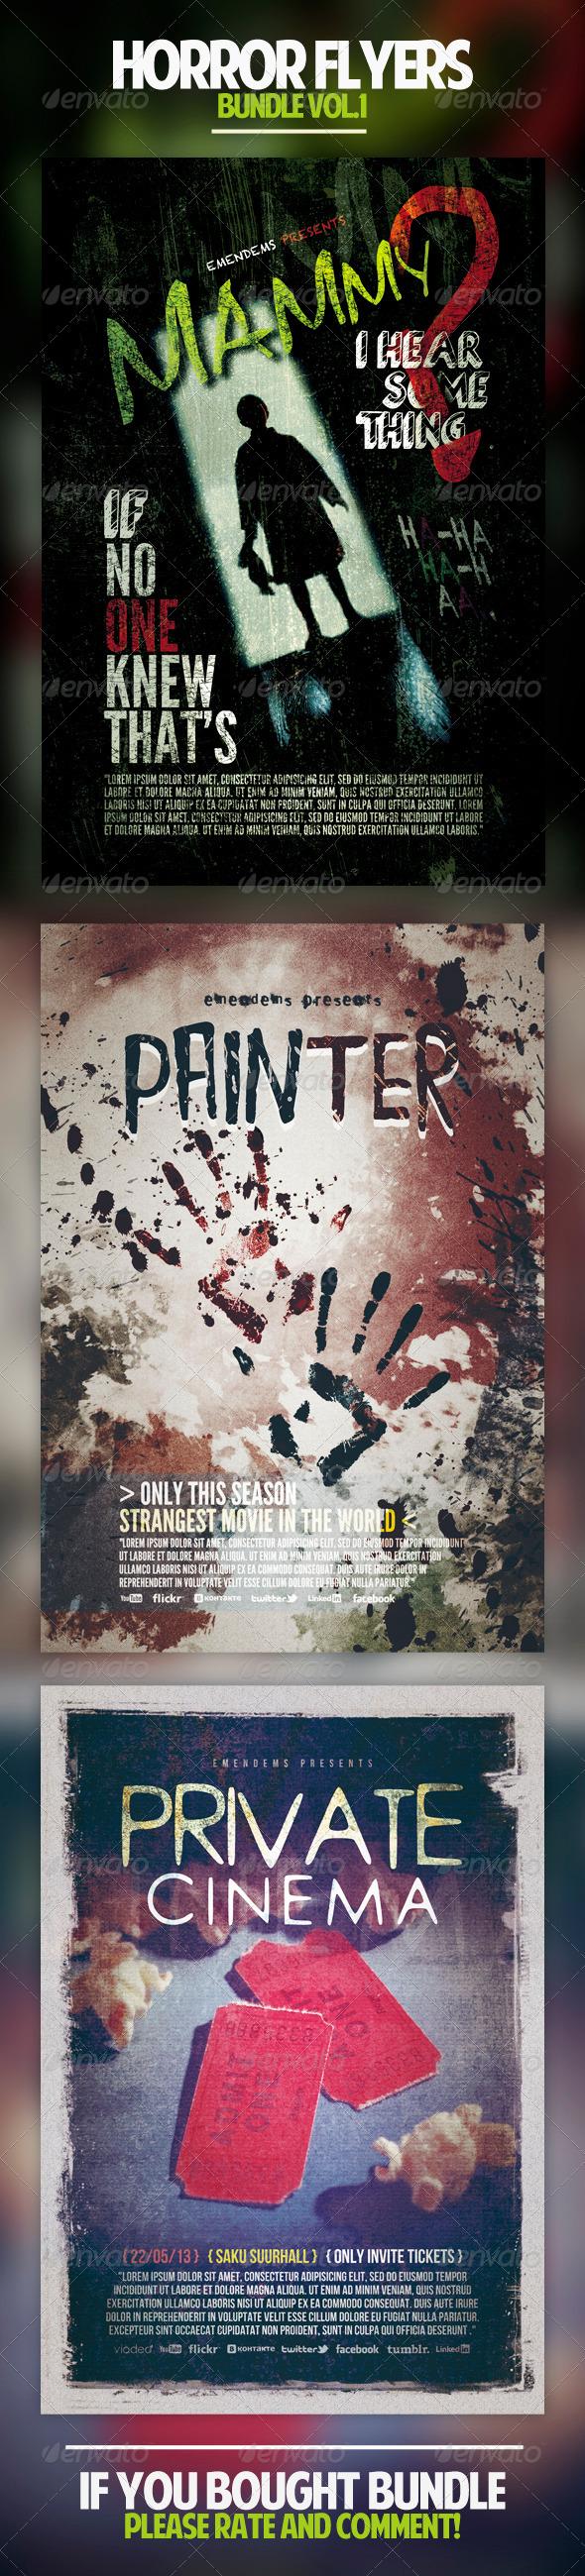 GraphicRiver Horror Flyers Bundle Vol.1 5031098